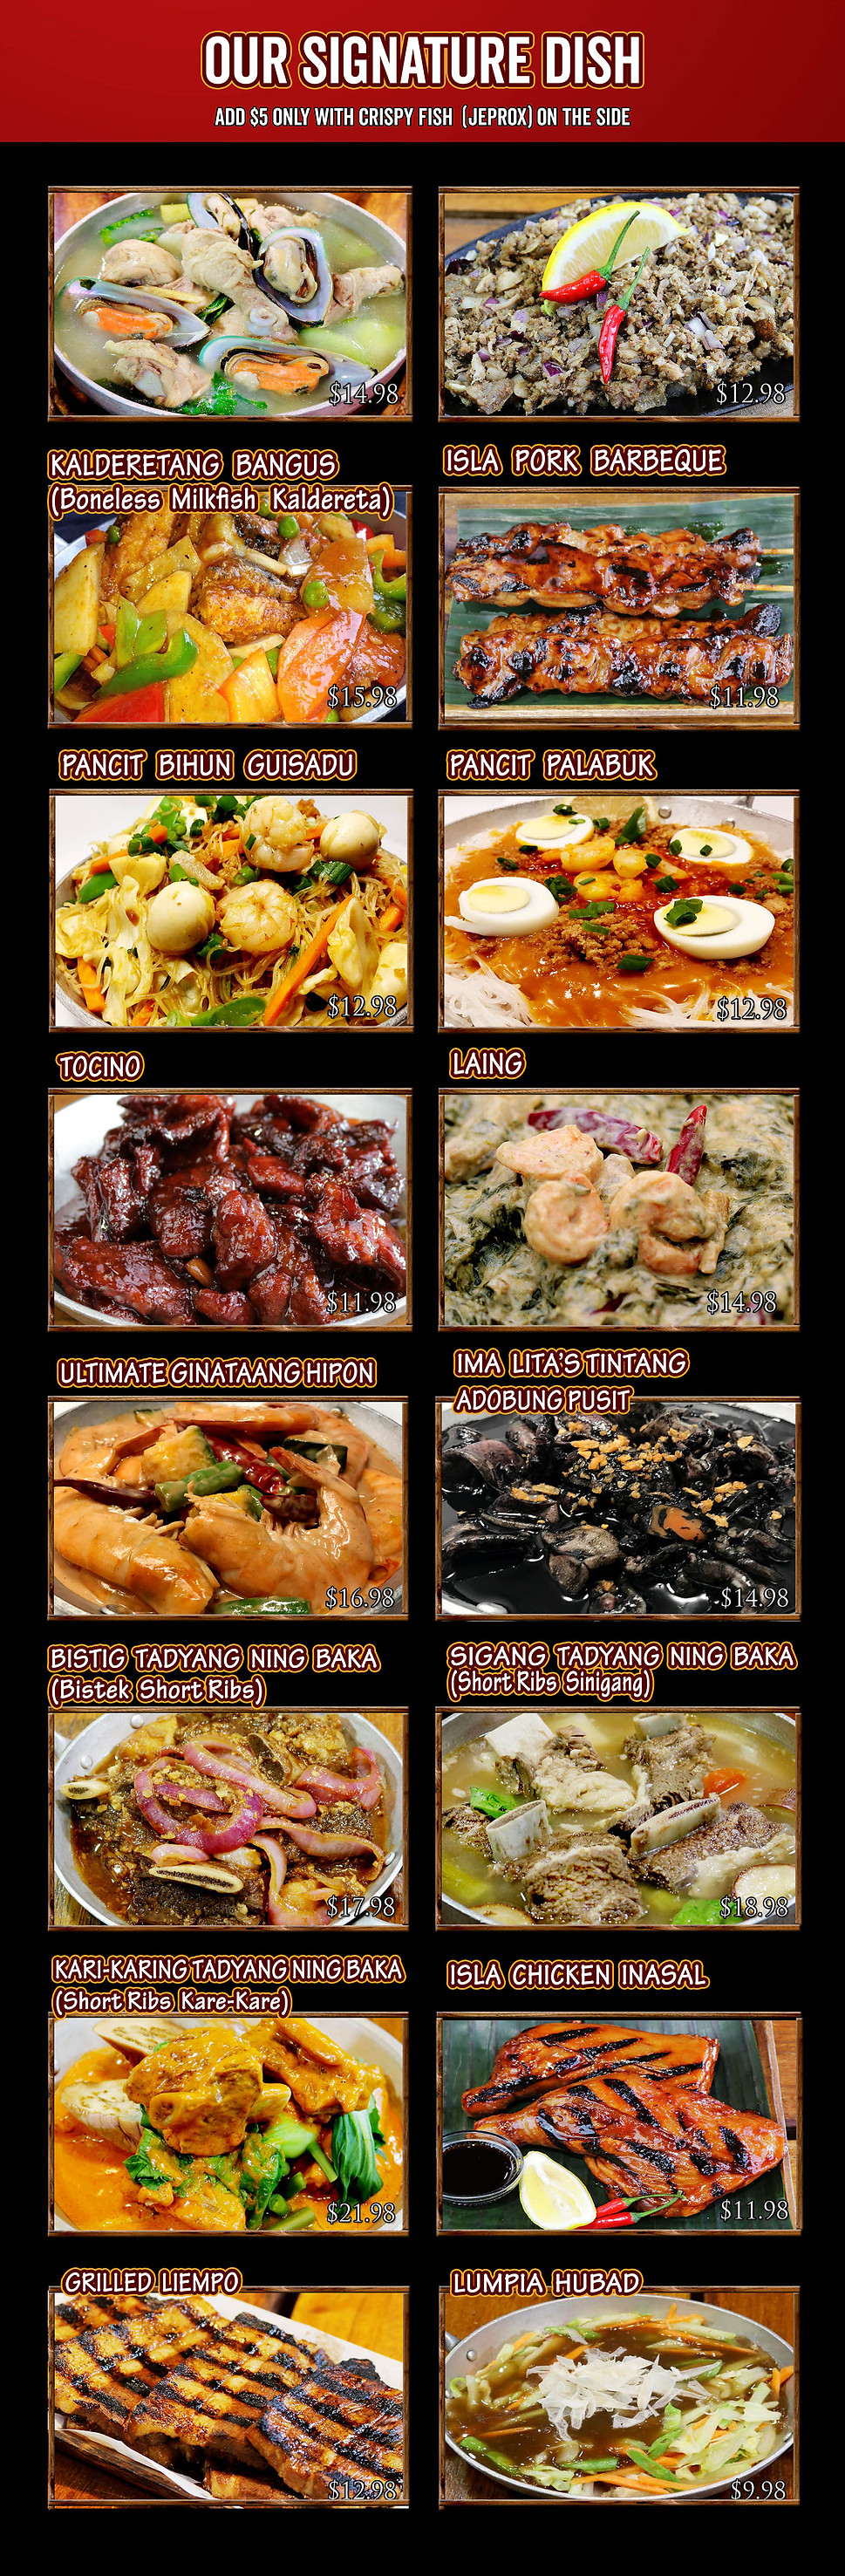 Our Signature Dish.jpg